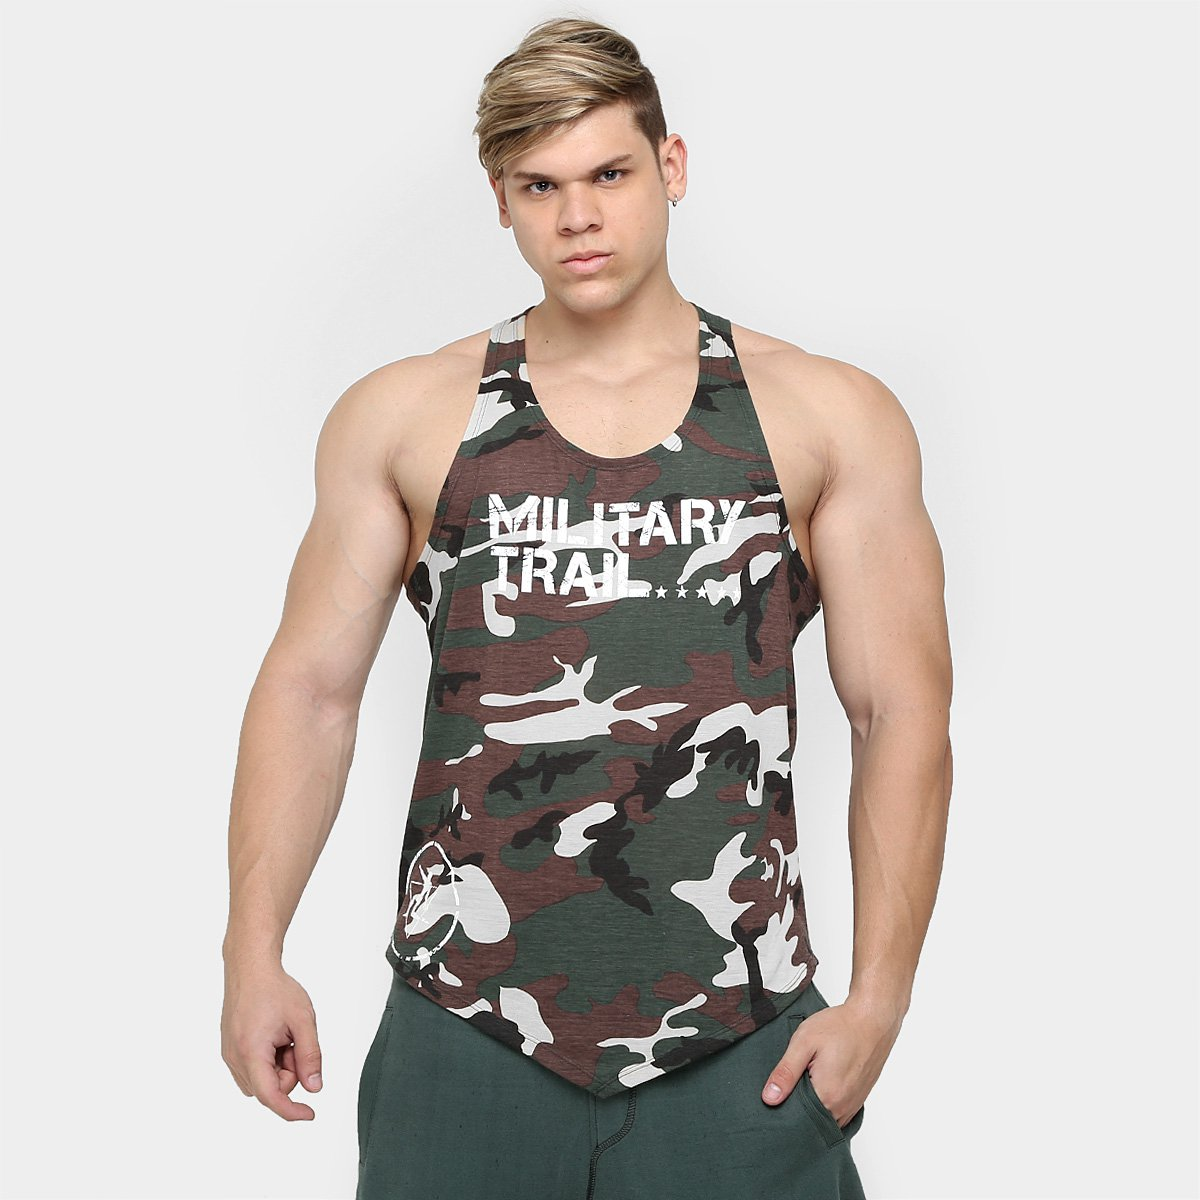 955e9e8ade9e3 Camiseta Regata Combat Masculina Military Trail - Midway USA - Compre Agora